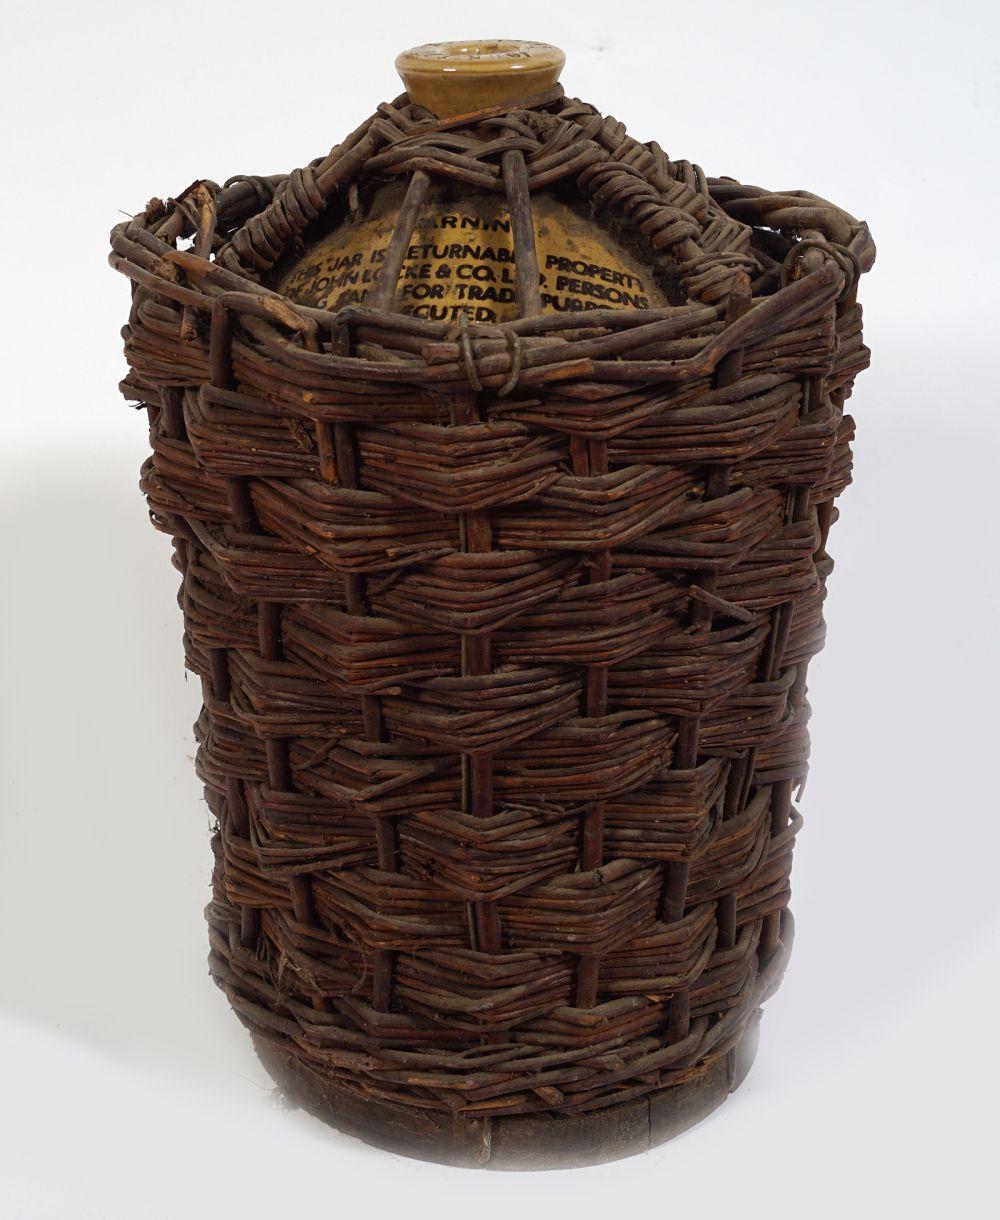 LATE 19TH-CENTURY JOHN LOCKE'S WHISKEY JAR